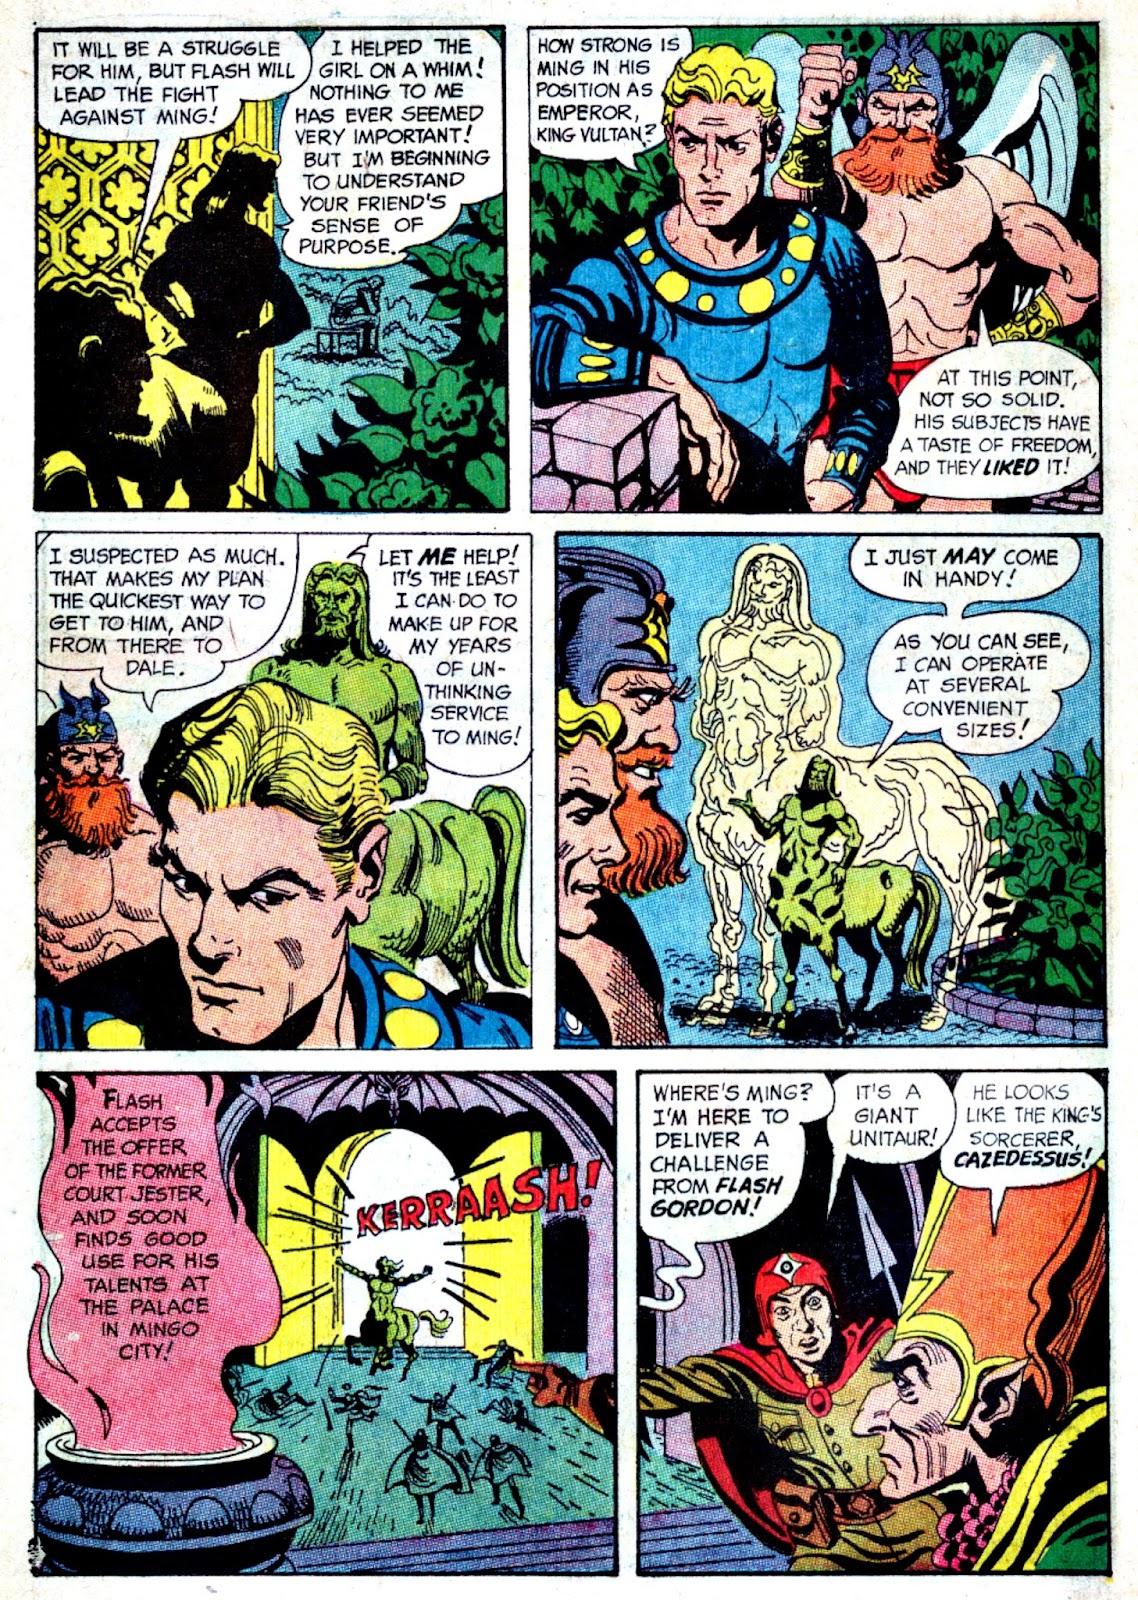 Flash Gordon (1966) issue 3 - Page 23